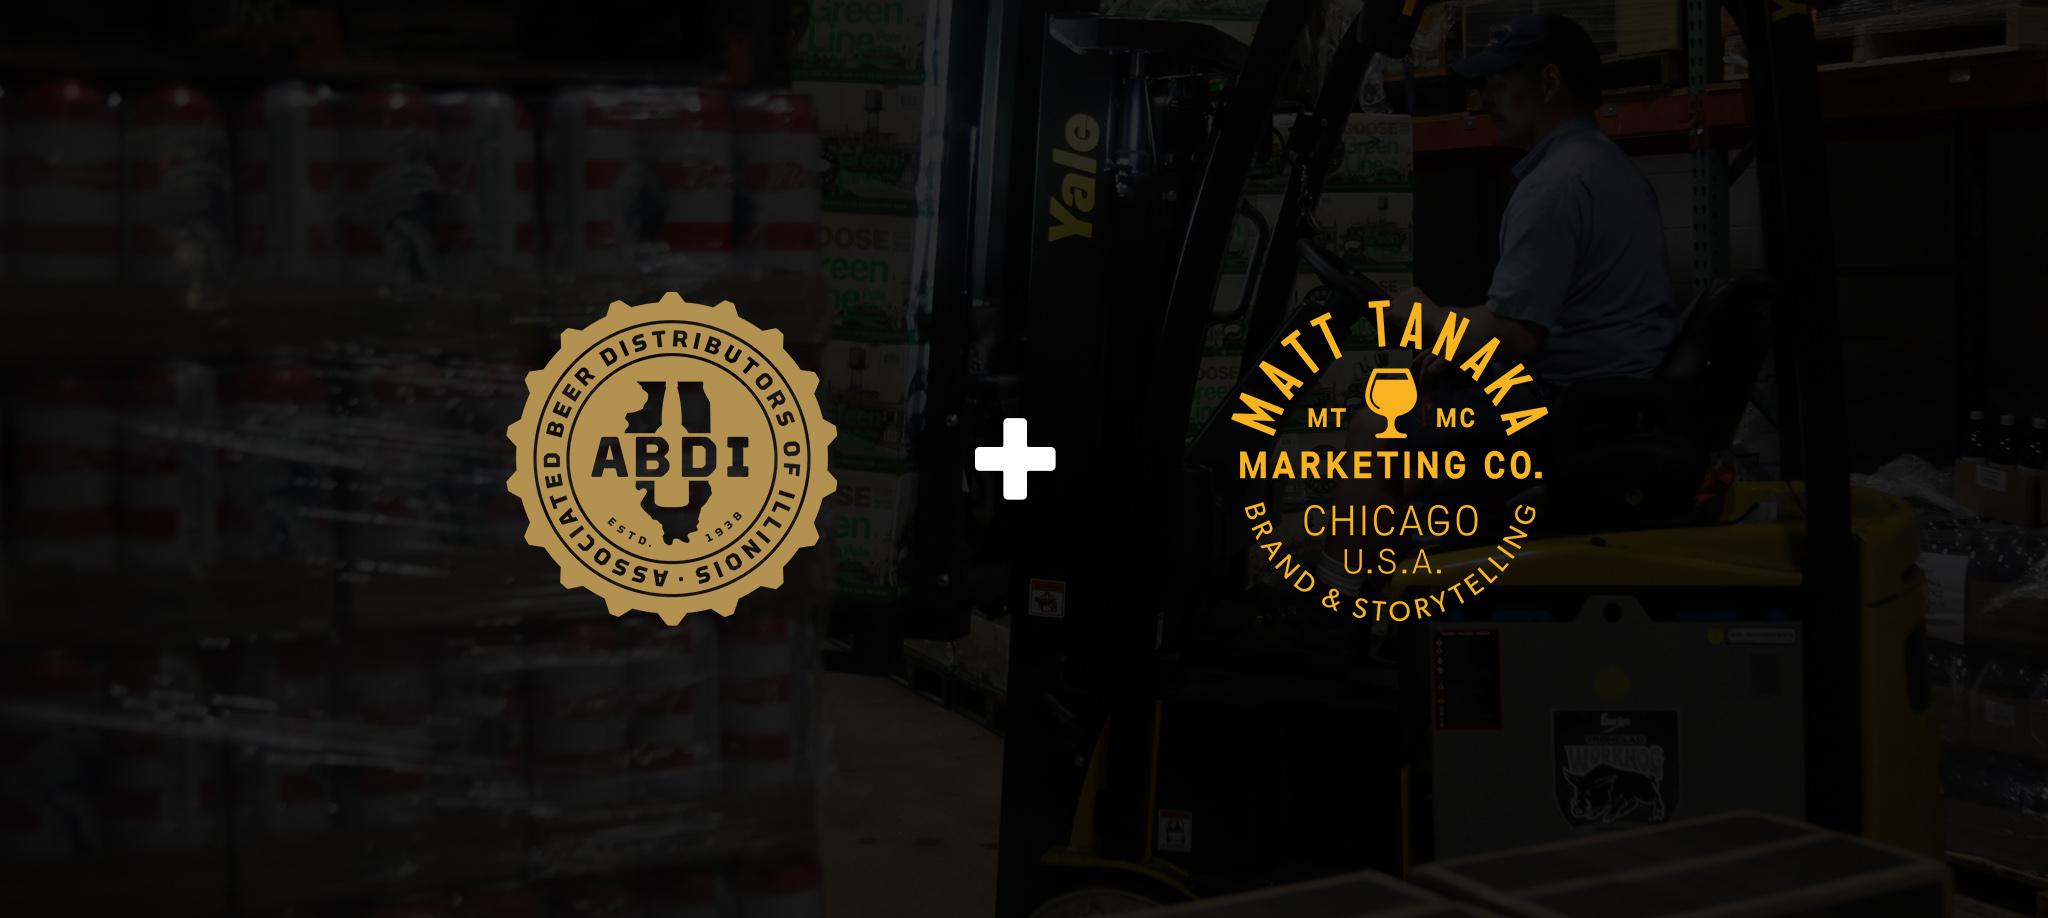 ABDI and Matt Tanaka Marketing